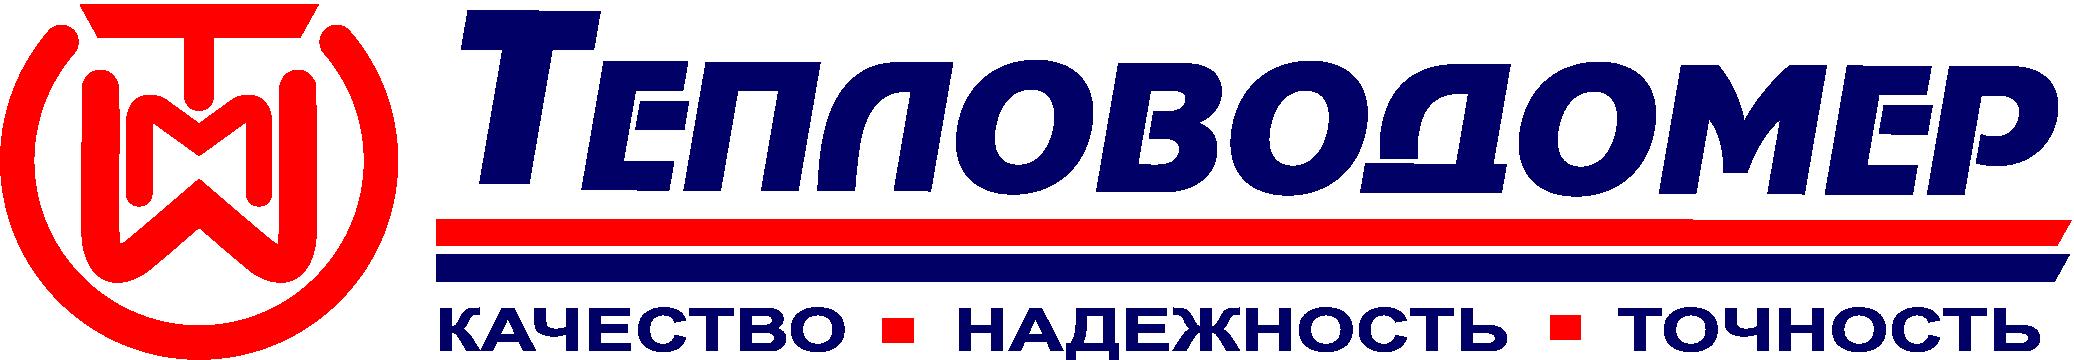 Картинки по запросу тепловодомер счетчик логотип